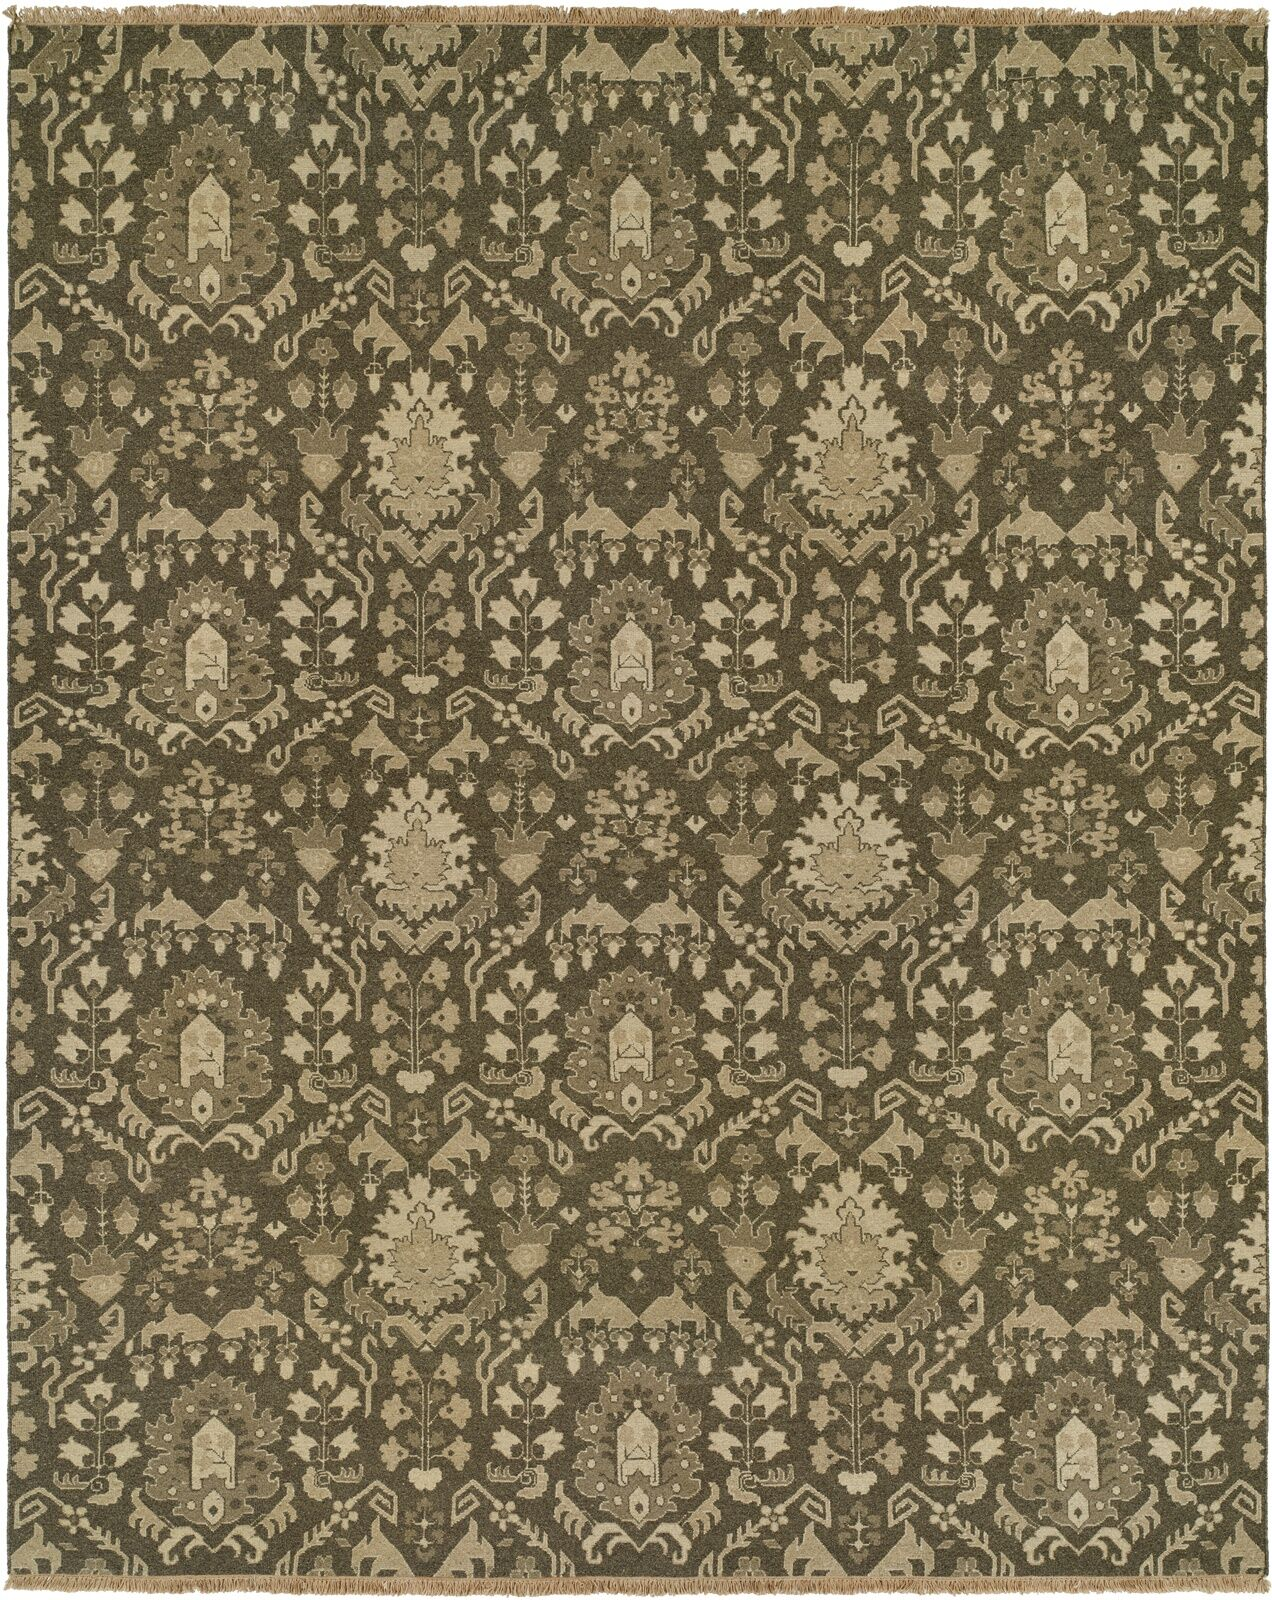 Timaru Light Brown Area Rug Rug Size: Rectangle 4' x 6'